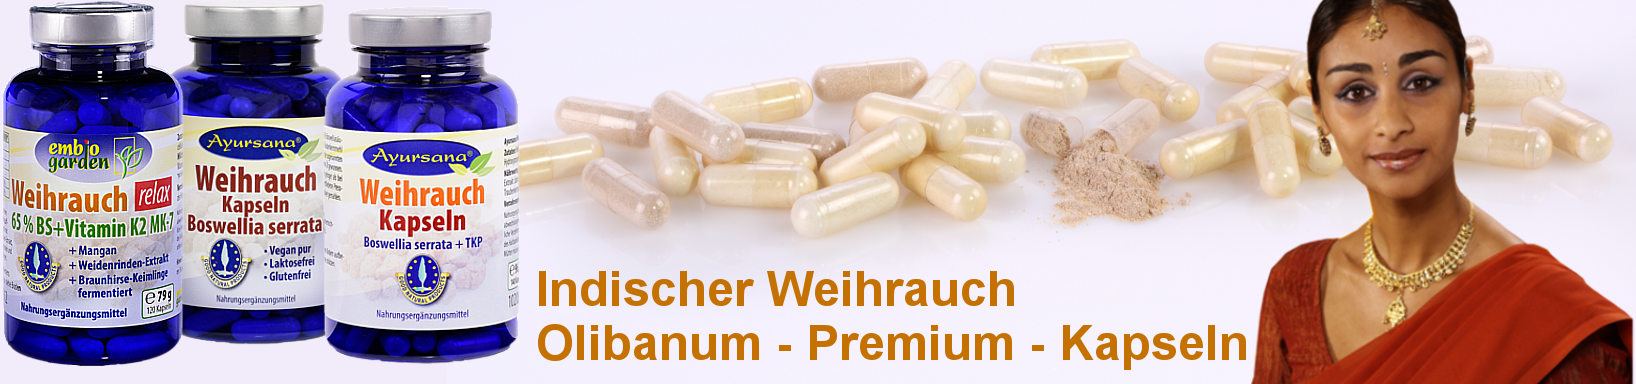 Banner-Weihrauch-Kapseln-Unterkategorie-040517